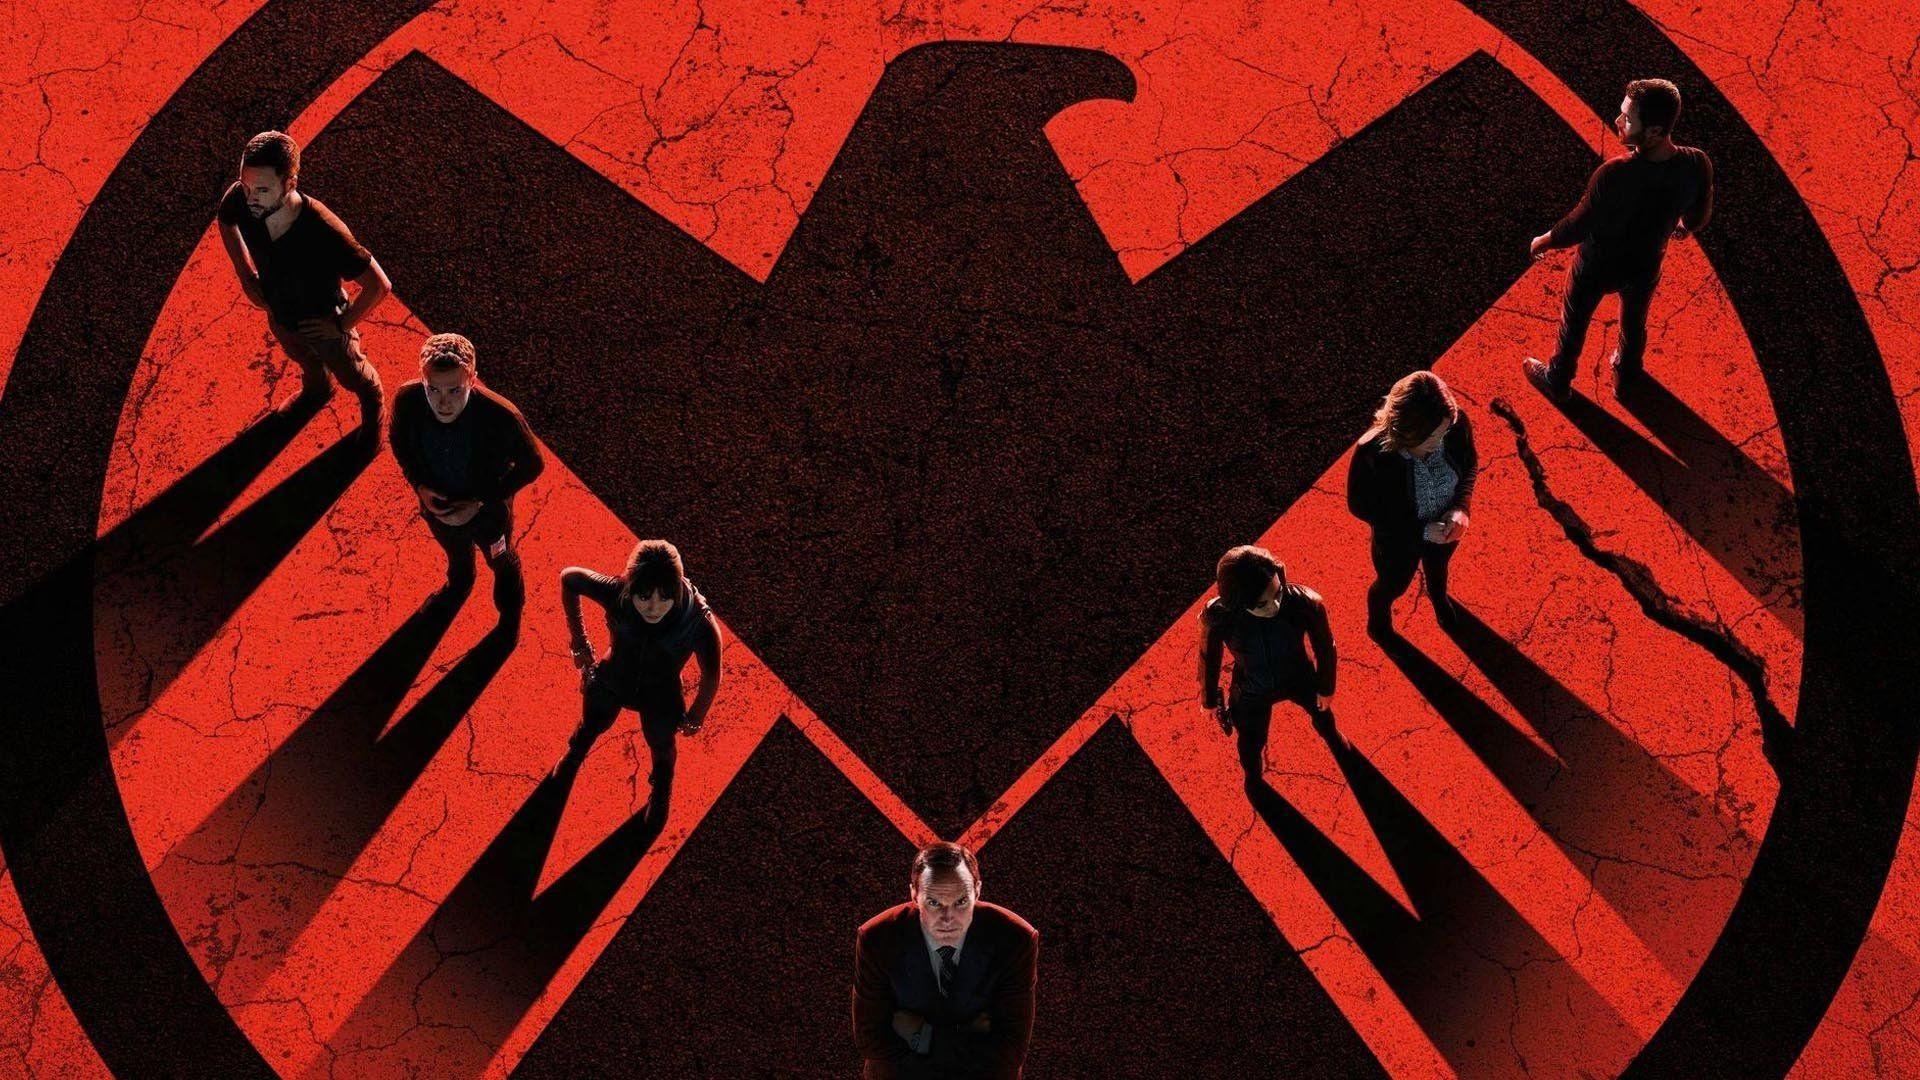 Agents Of S.H.I.E.L.D Teams Background 4